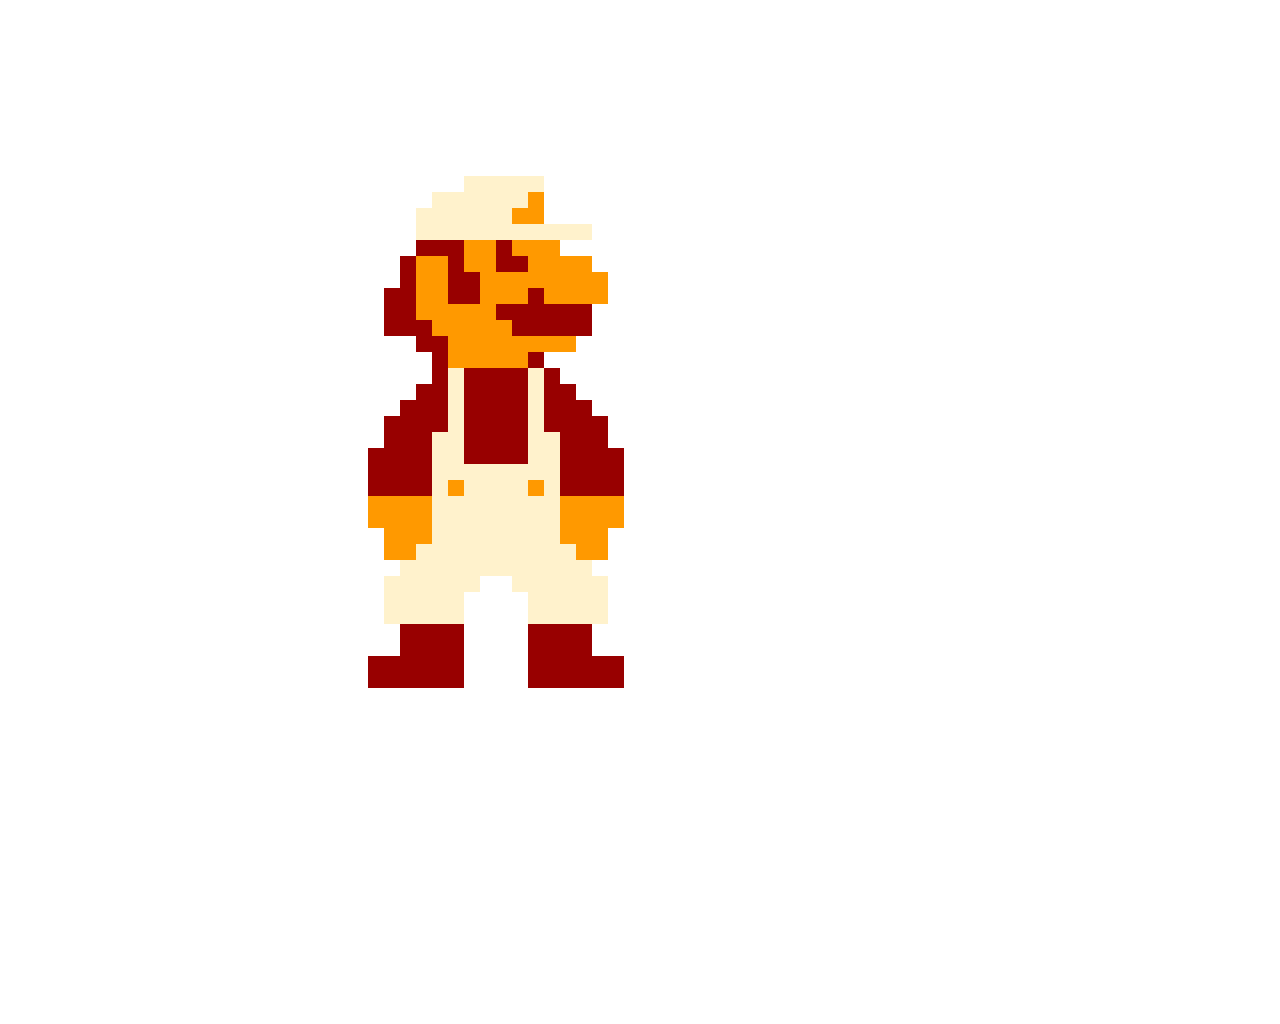 Fire Mario (SMB1 Styled)